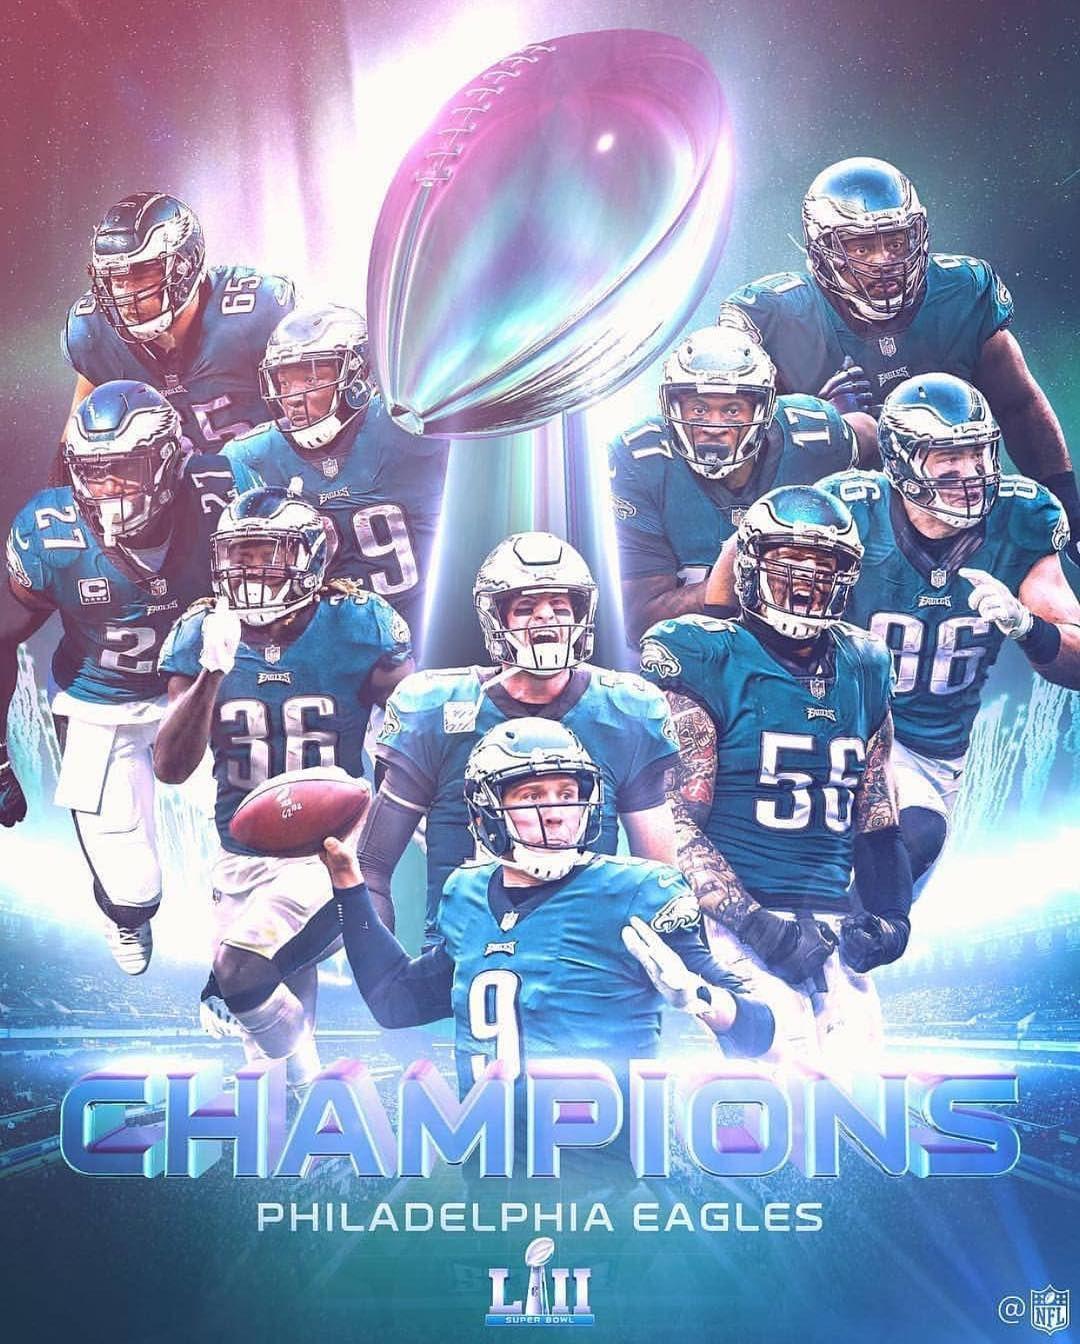 b06760f2099 Super Bowl champs  philadelphiaeagles  eagles  philadelphia  superbowl  52   superbowl52  champions  nfl